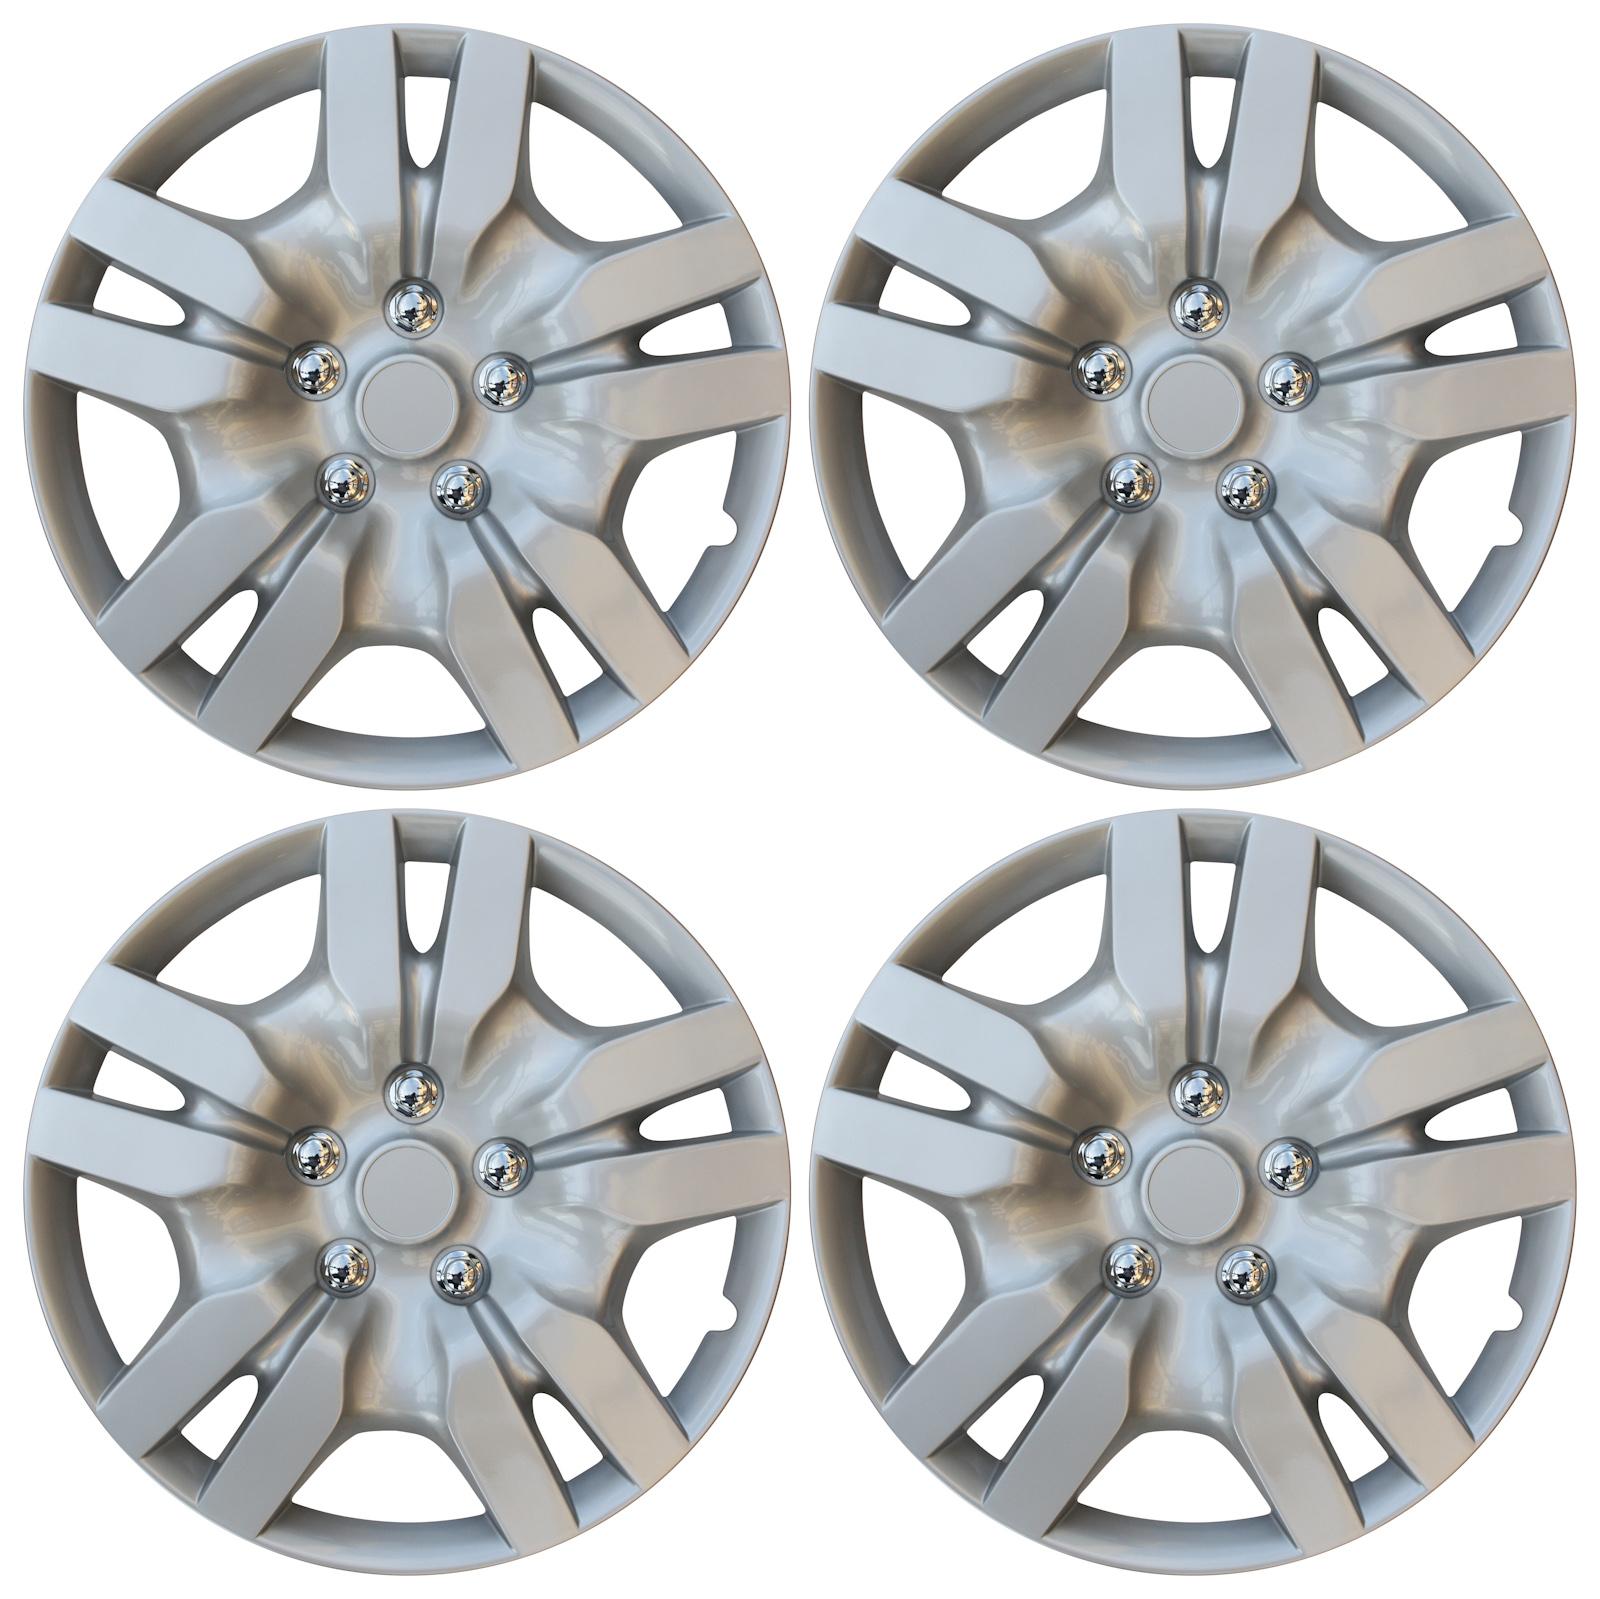 "4 Piece Set of Aftermarket Wheel Cover 16"" fits Nissan Altima Replica Hub Cap Hubcaps"